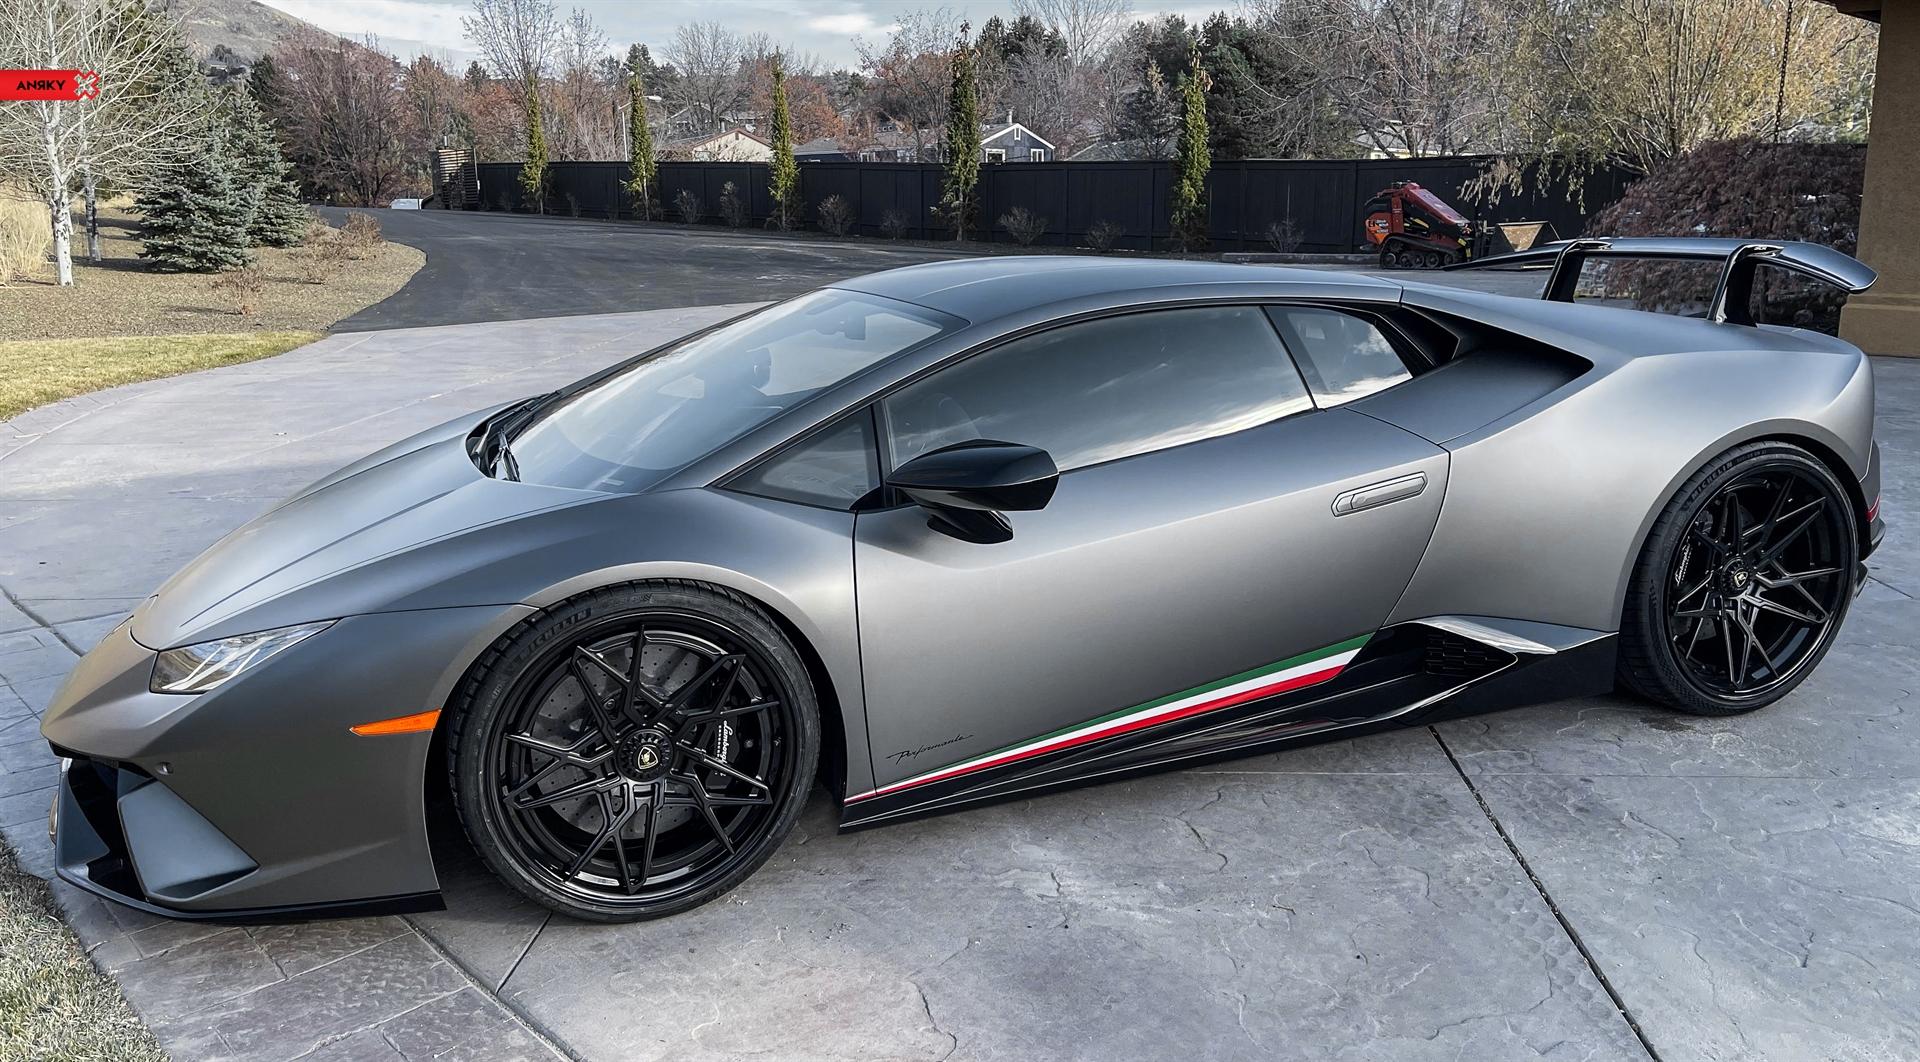 Lamborghini Huracan Performante – X|Series S3-X2